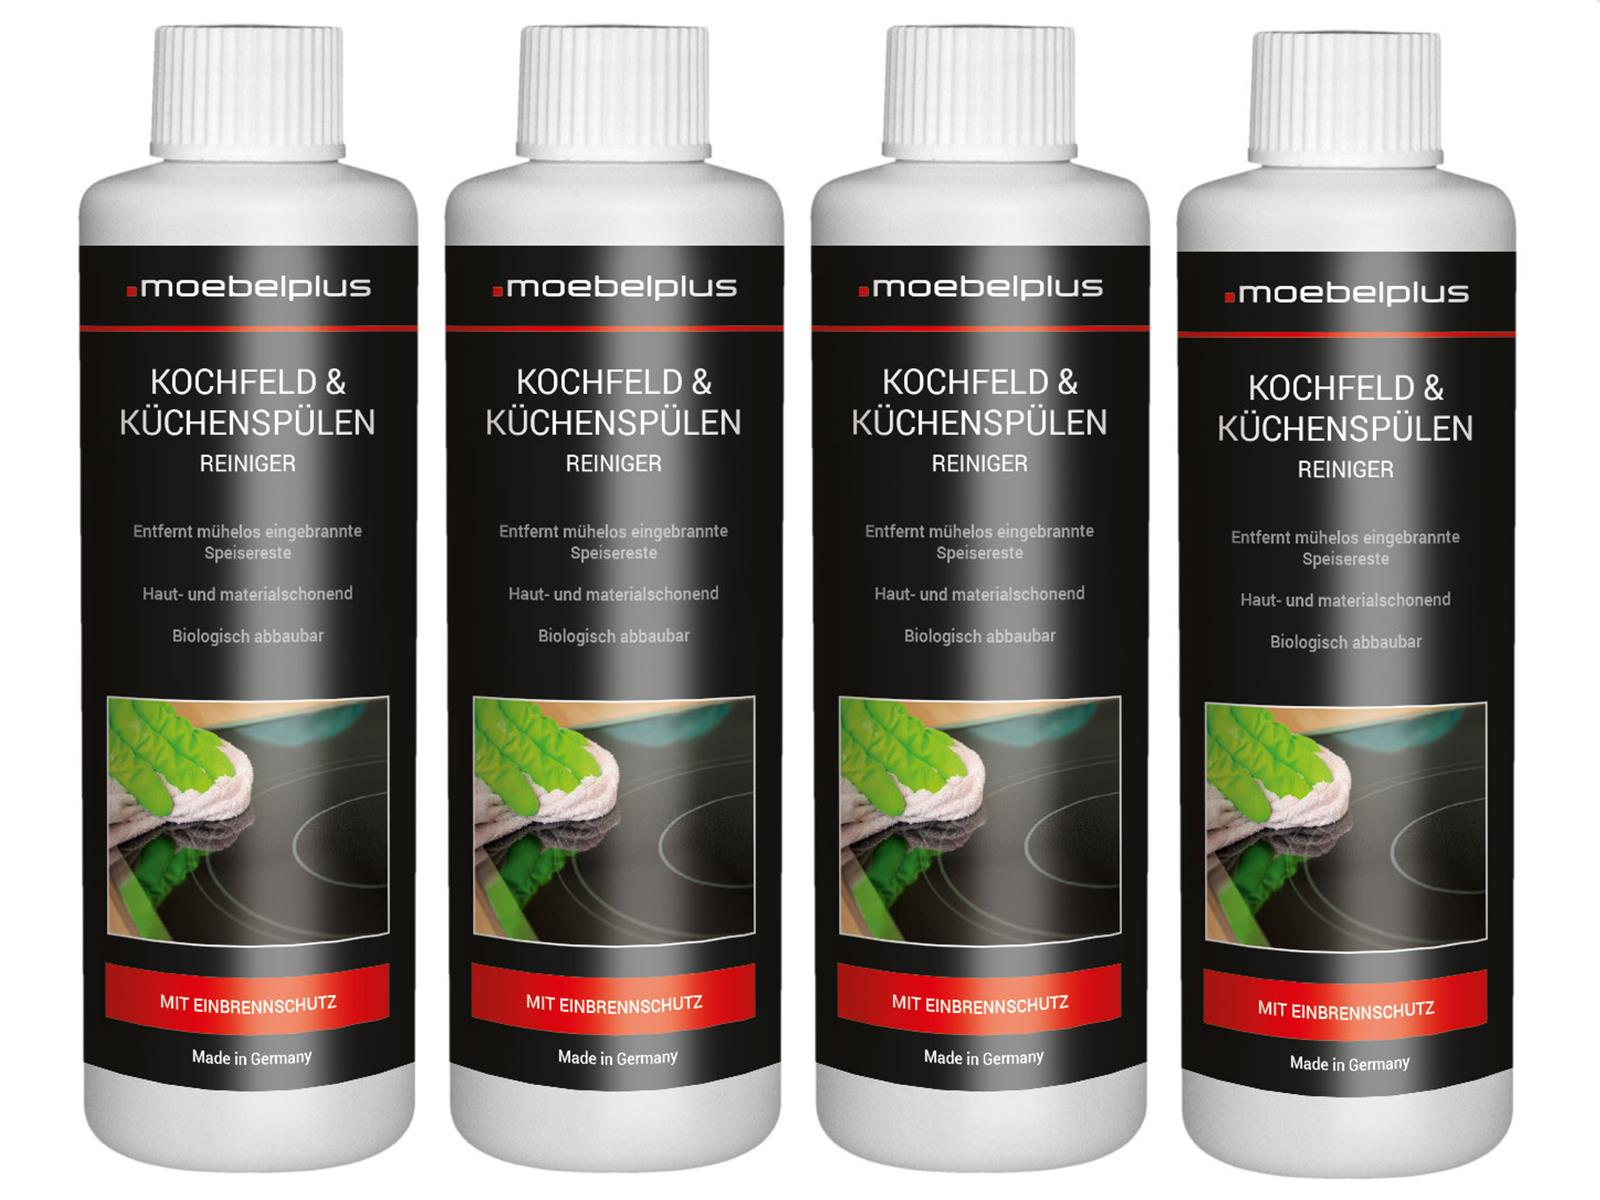 moebelplus Kochfeld & Küchenspülen Reiniger - 4er Set